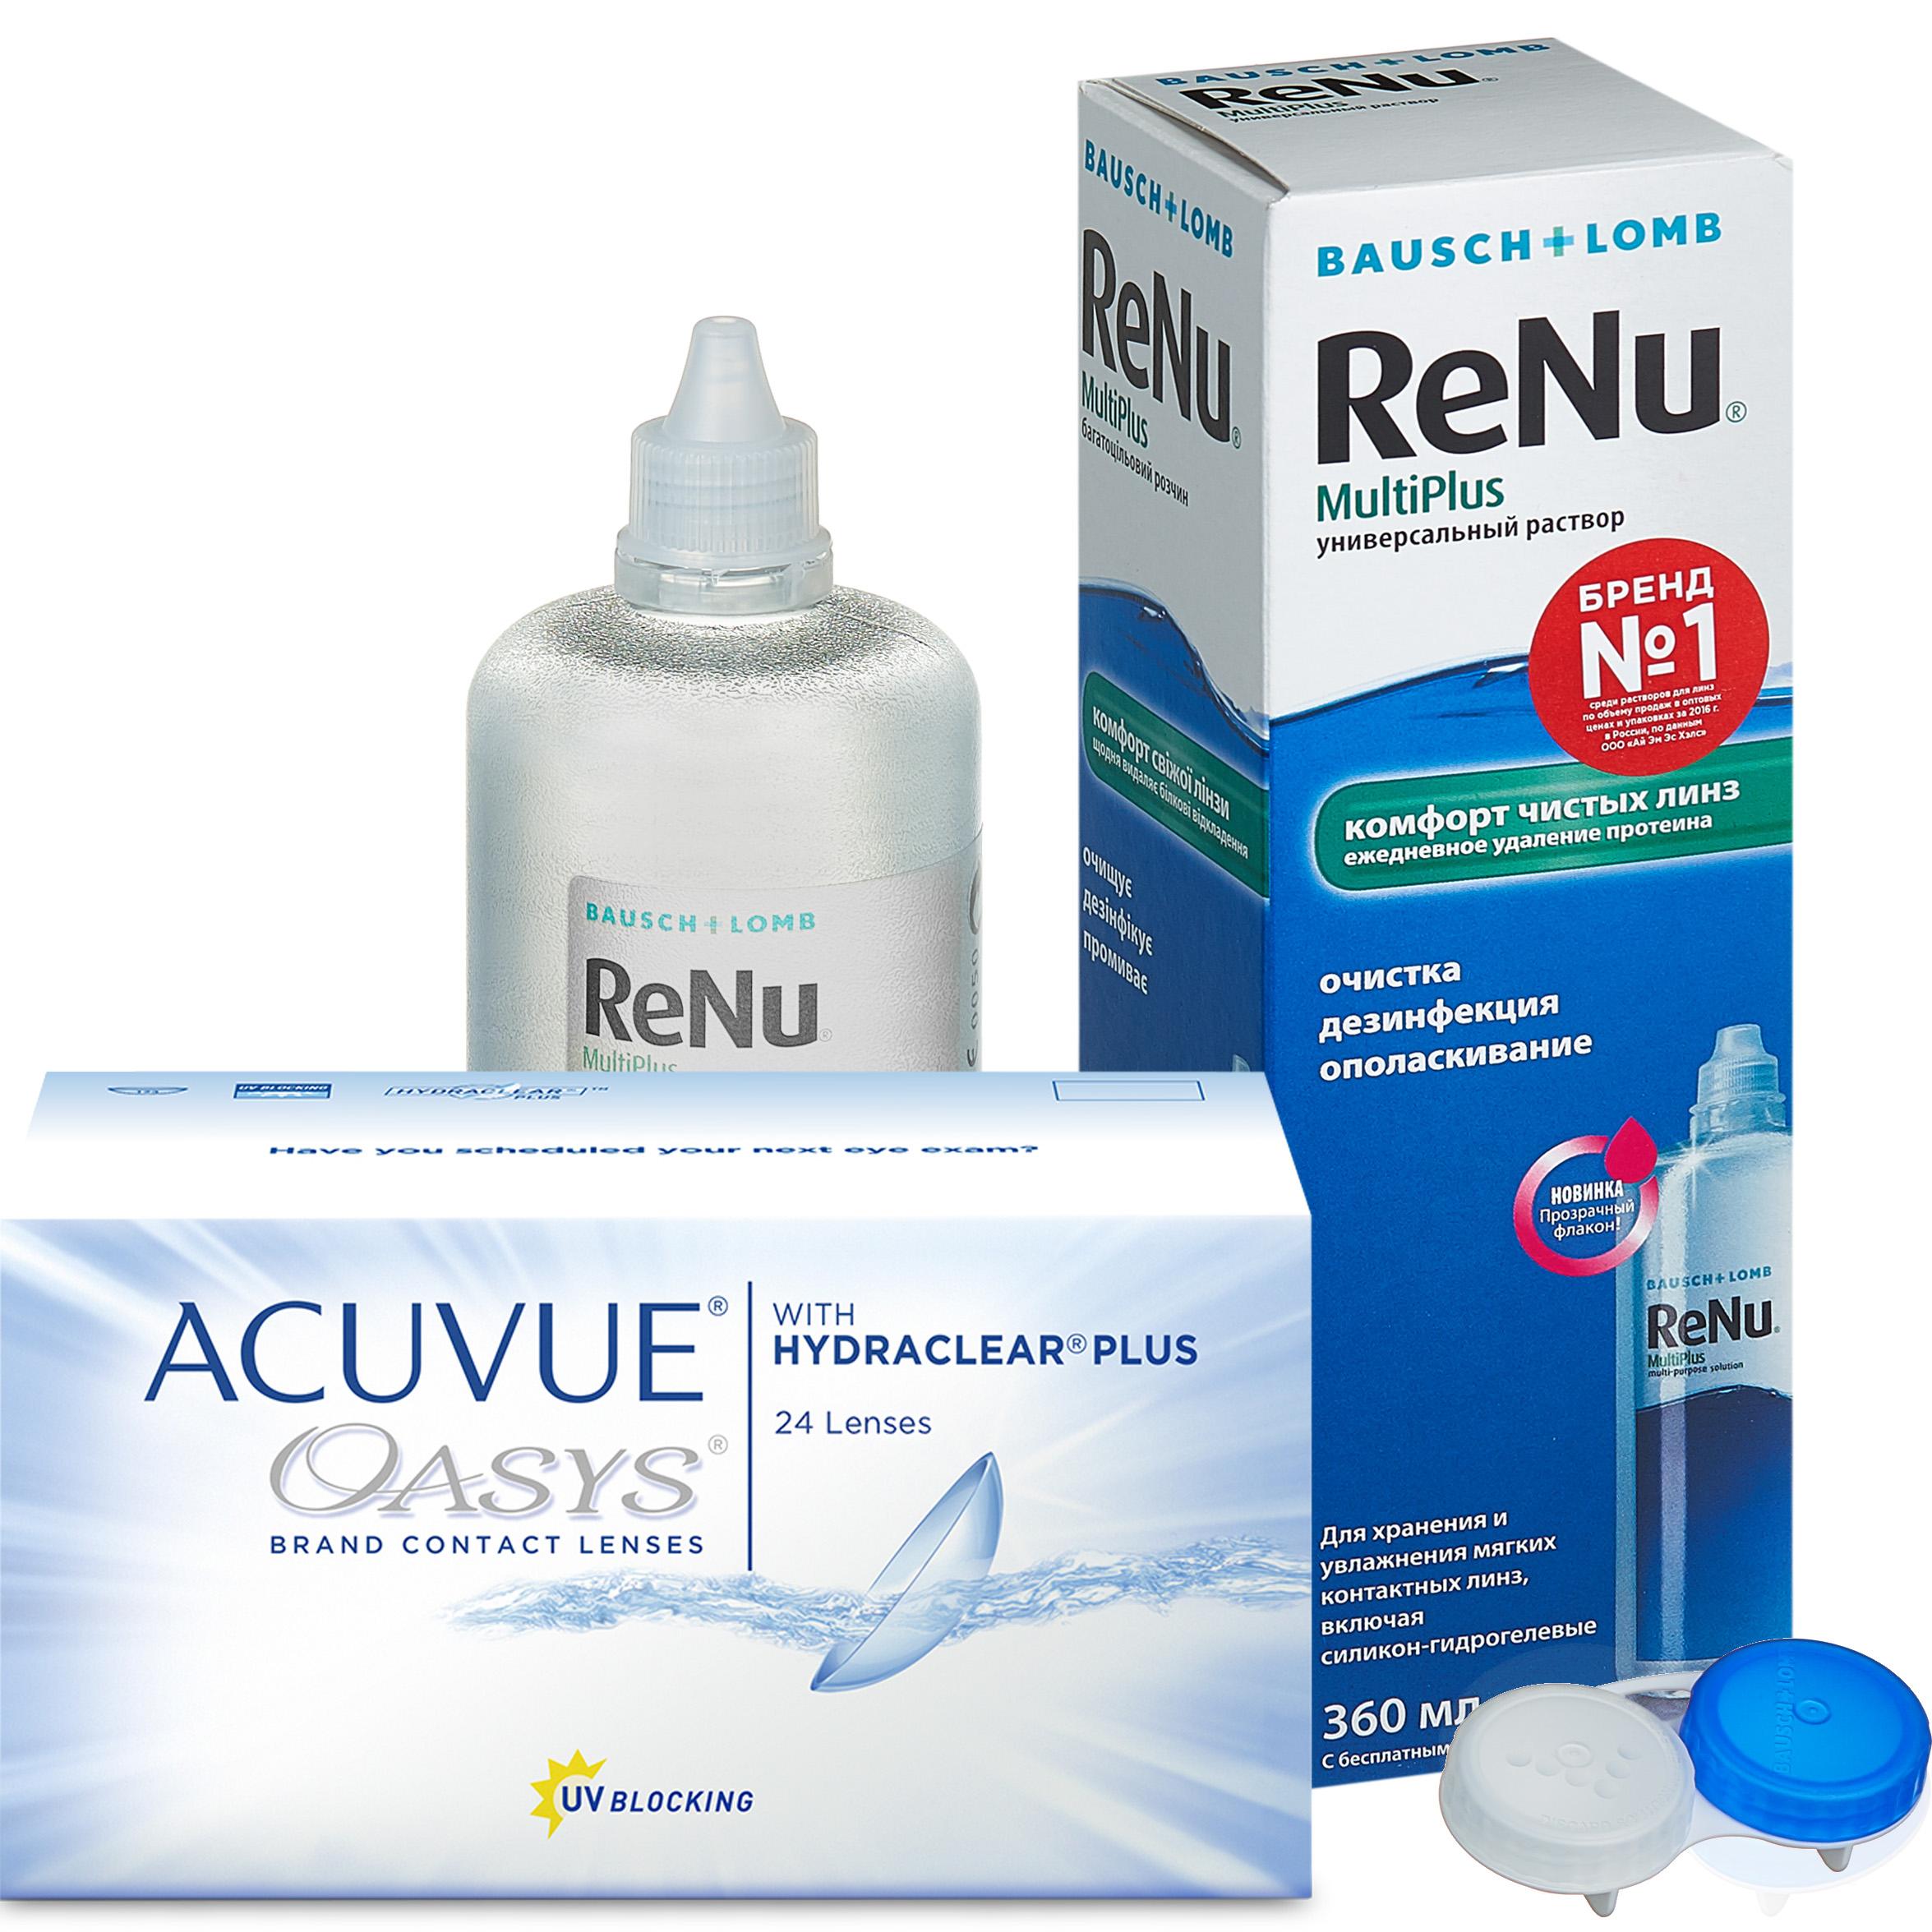 Купить Oasys with Hydraclear Plus 24 линзы + ReNu MultiPlus, Линзы Acuvue Oasys with Hydraclear Plus 24 линзы R 8.4 -8, 00 + ReNu Multi Plus 360 мл